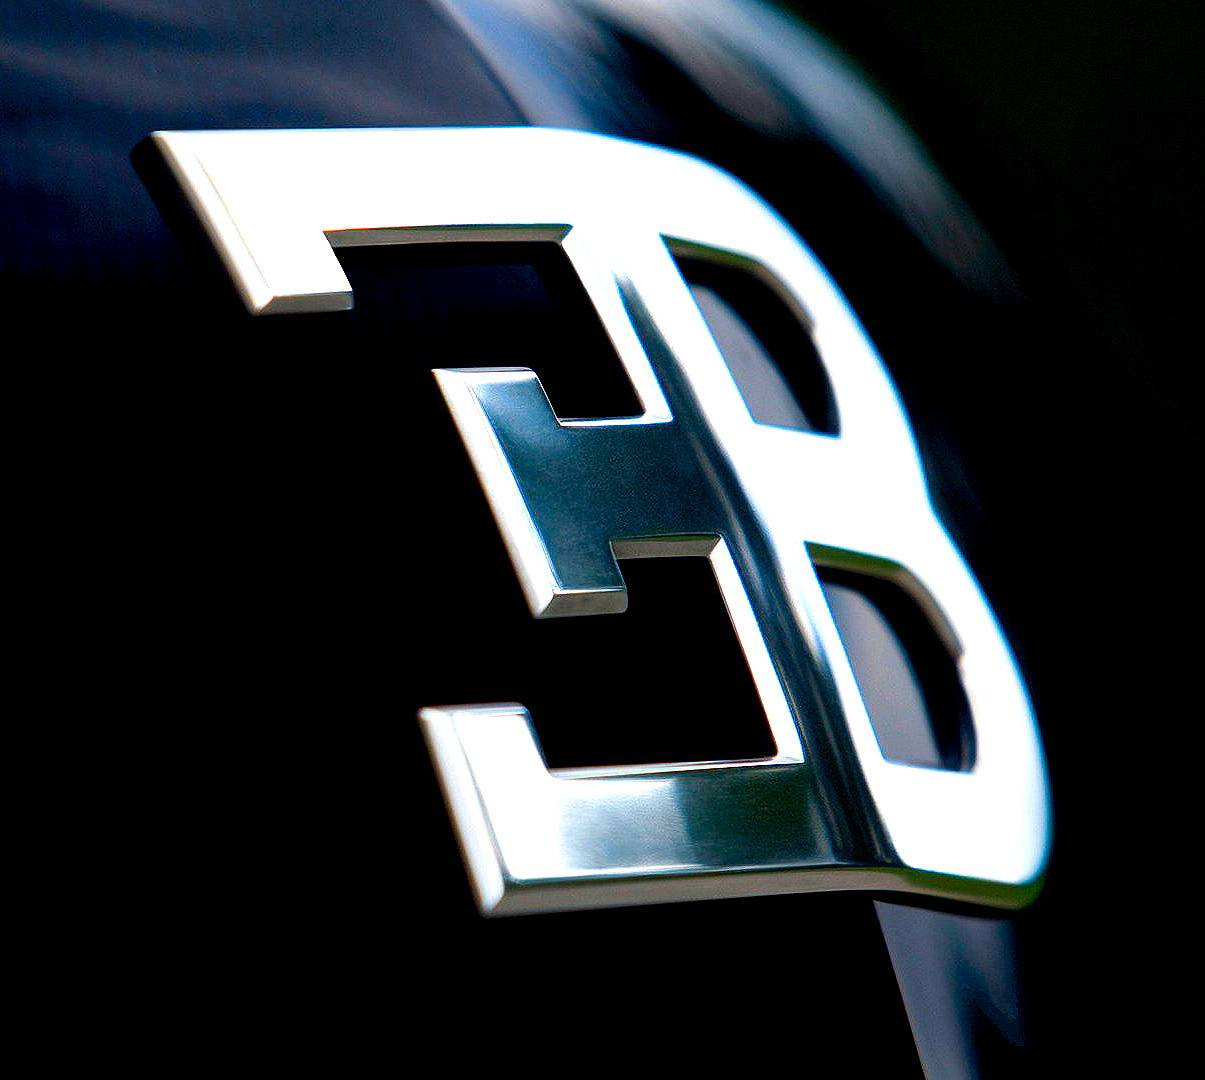 Bugatti Veyron Macro